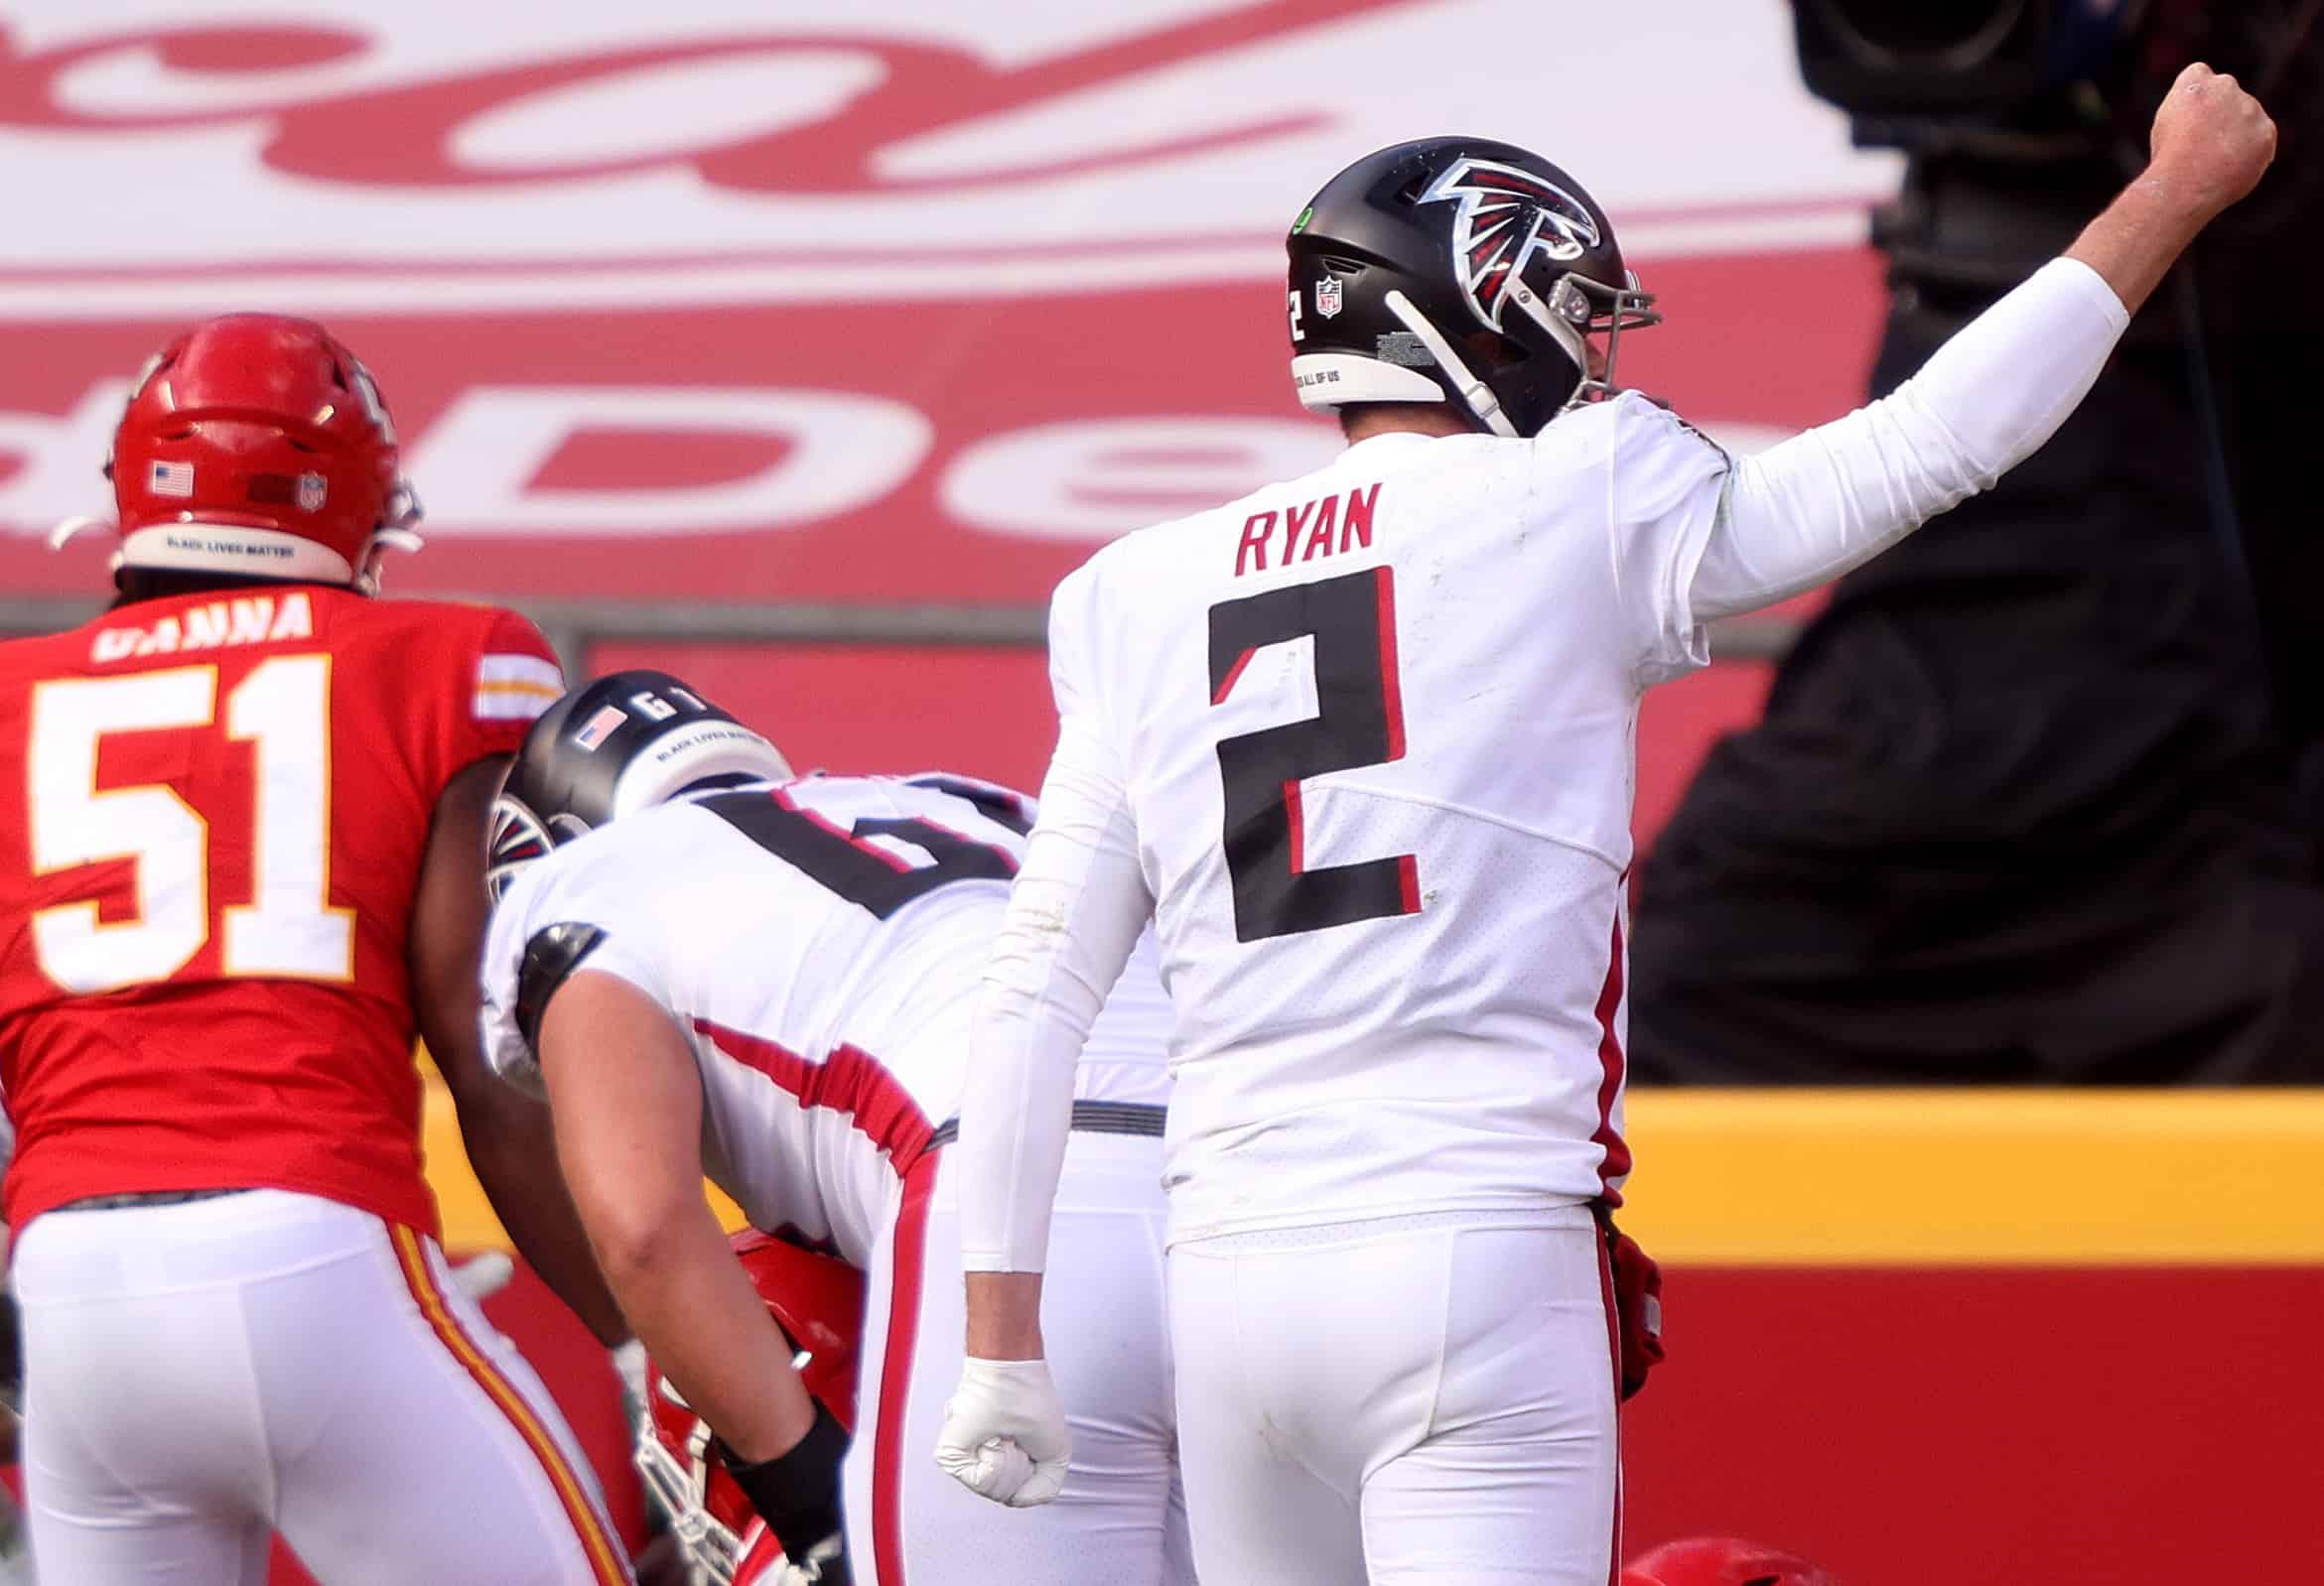 Matt Ryan #2 of the Atlanta Falcons celebrates his touchdown against the Kansas City Chiefs during the second quarter at Arrowhead Stadium on December 27, 2020 in Kansas City, Missouri.